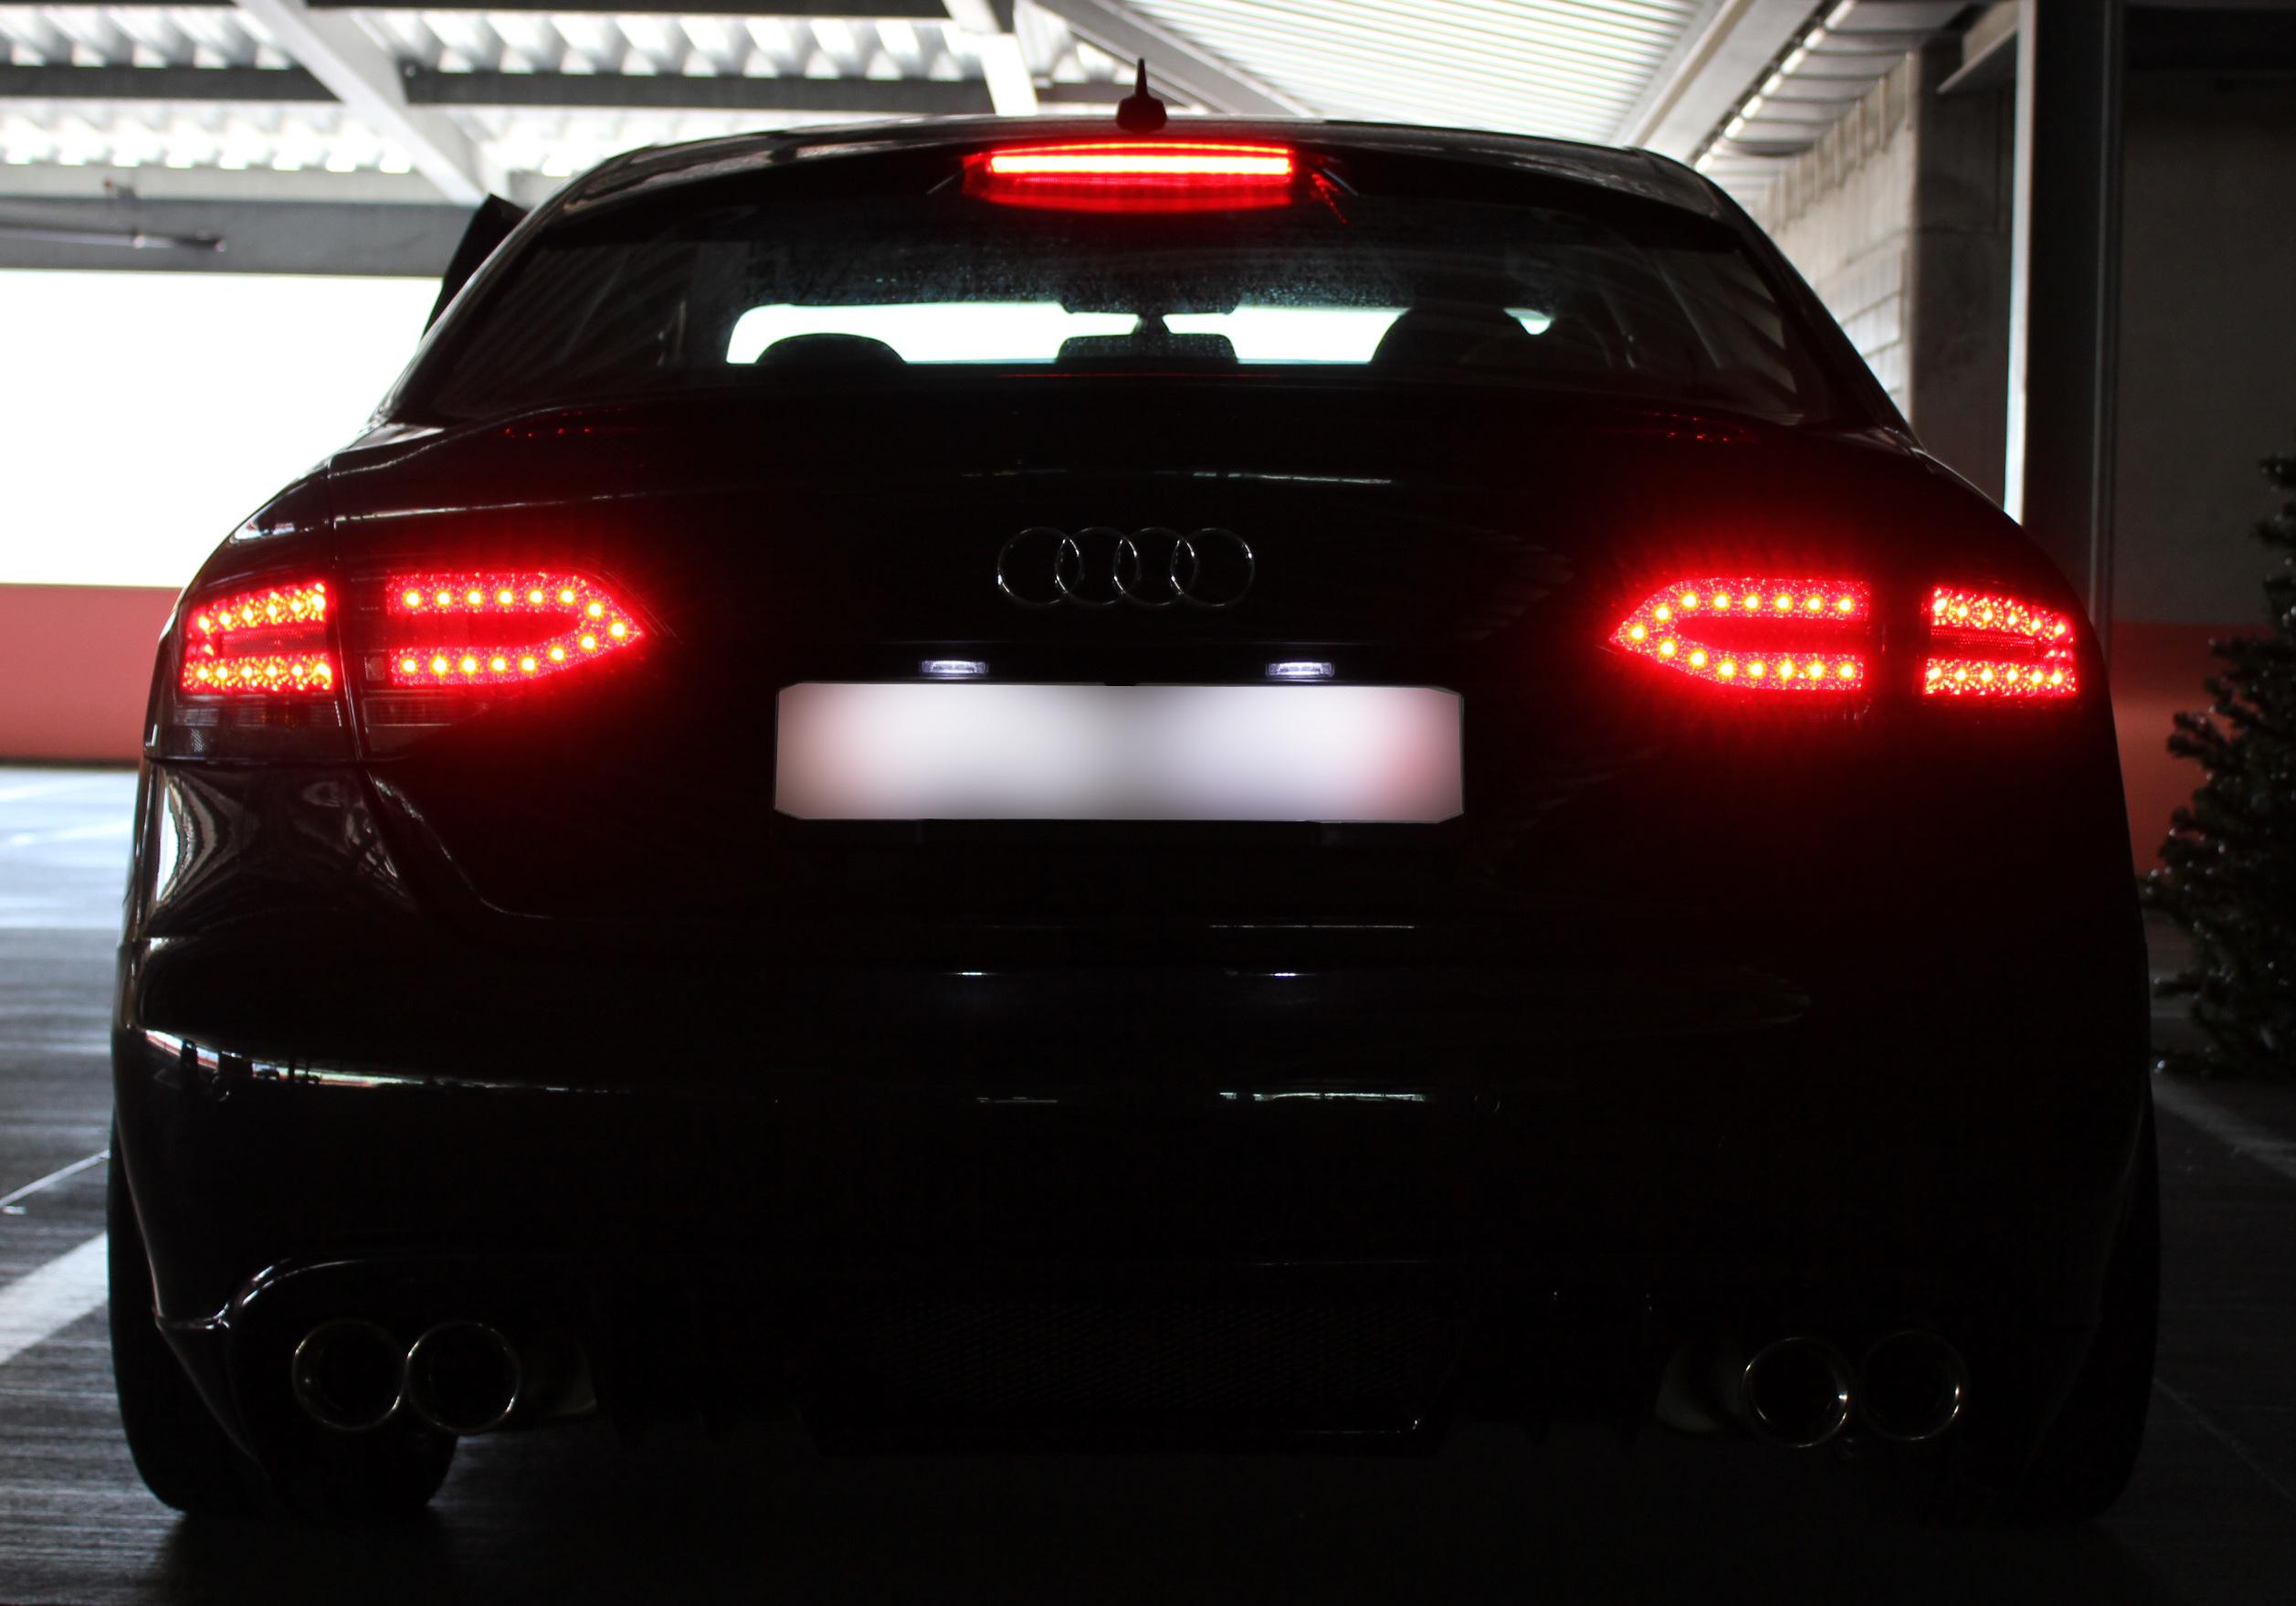 Auto Audi A4 3 2 Fsi Quattro Pagenstecher De Deine